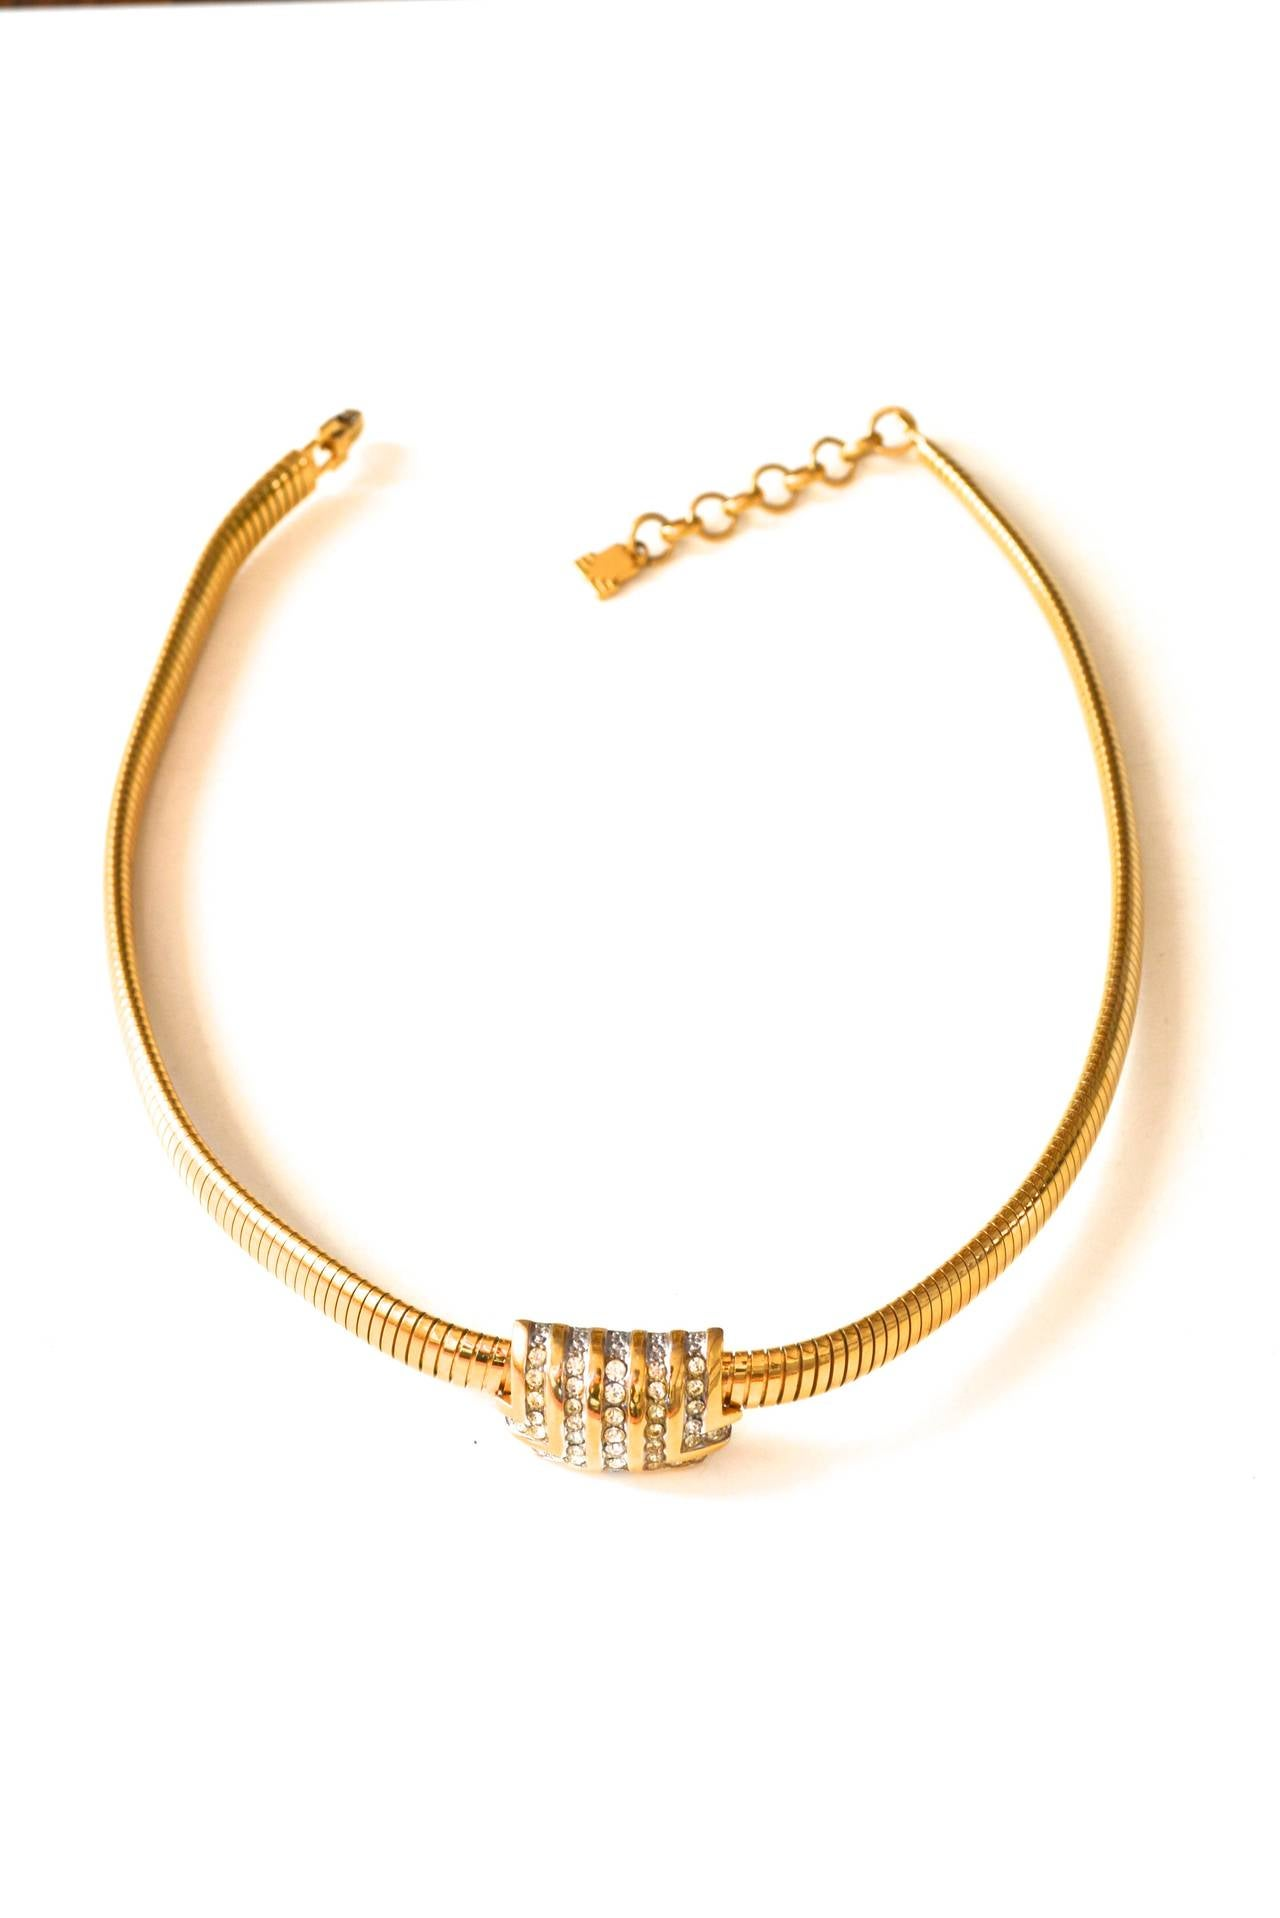 70s Lanvin Collar 4